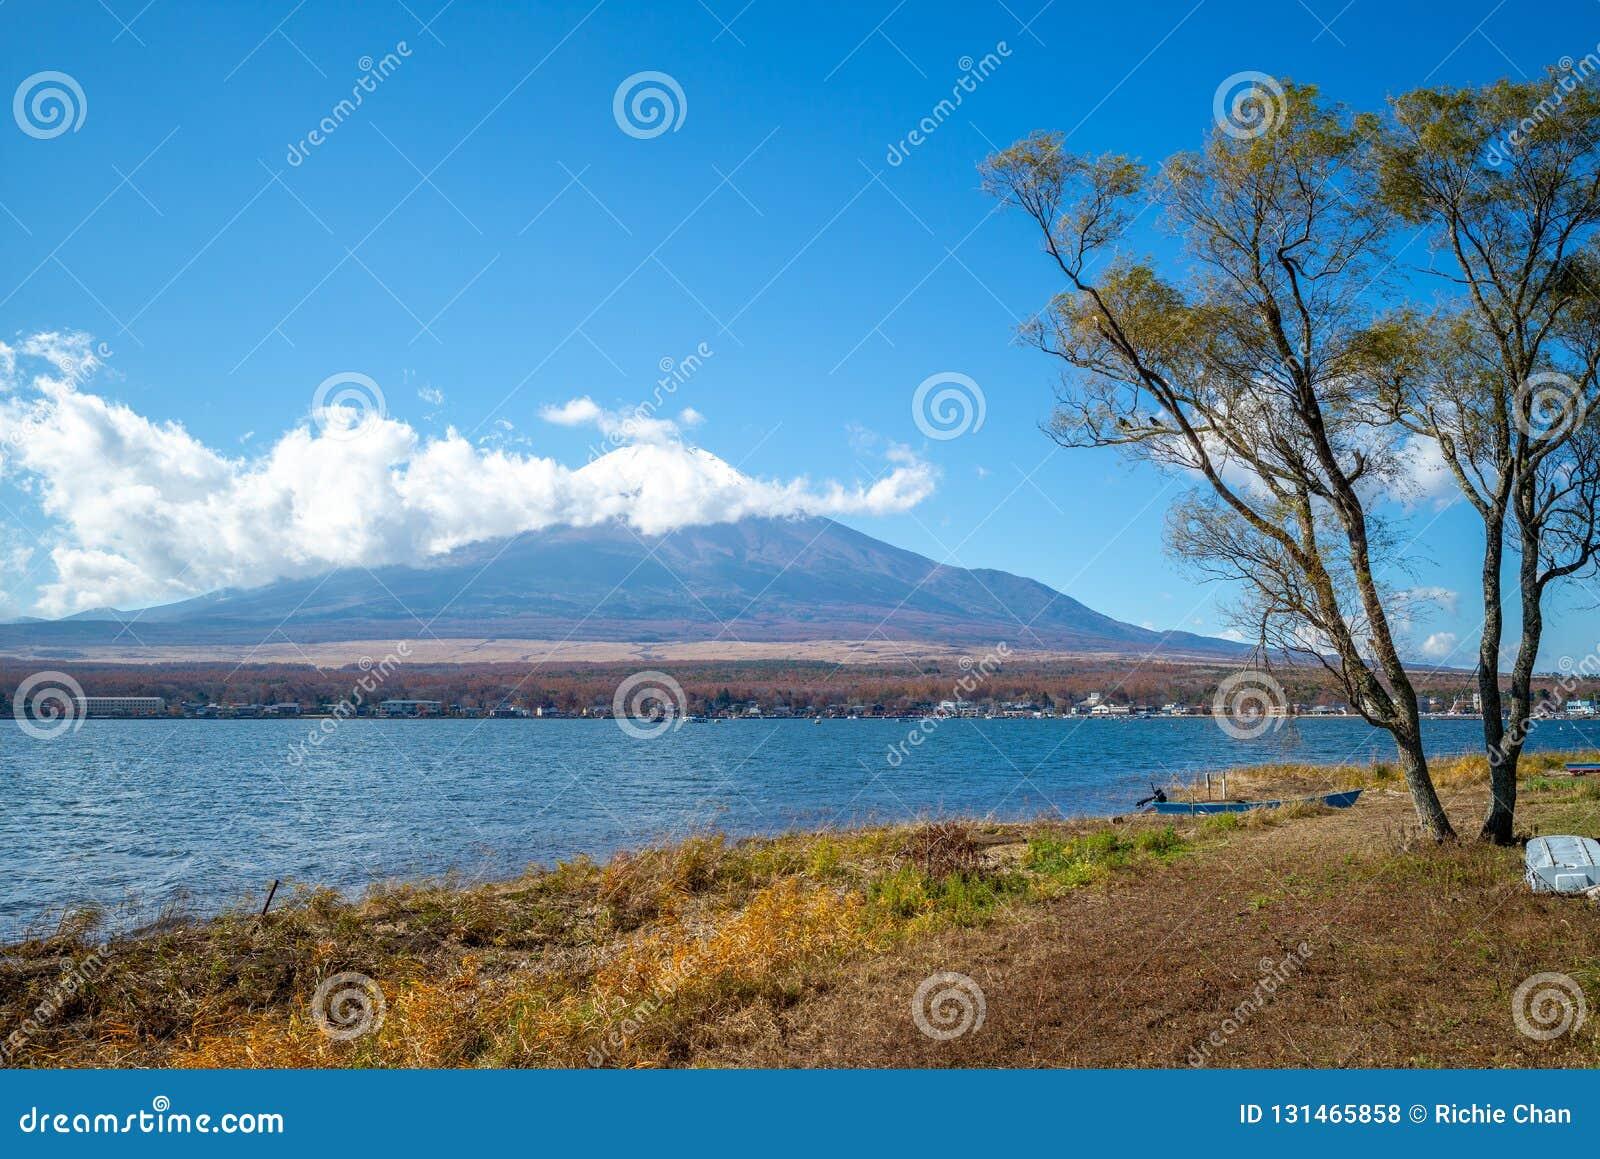 Mount Fuji и озеро Yamanaka в Yamanashi, Японии